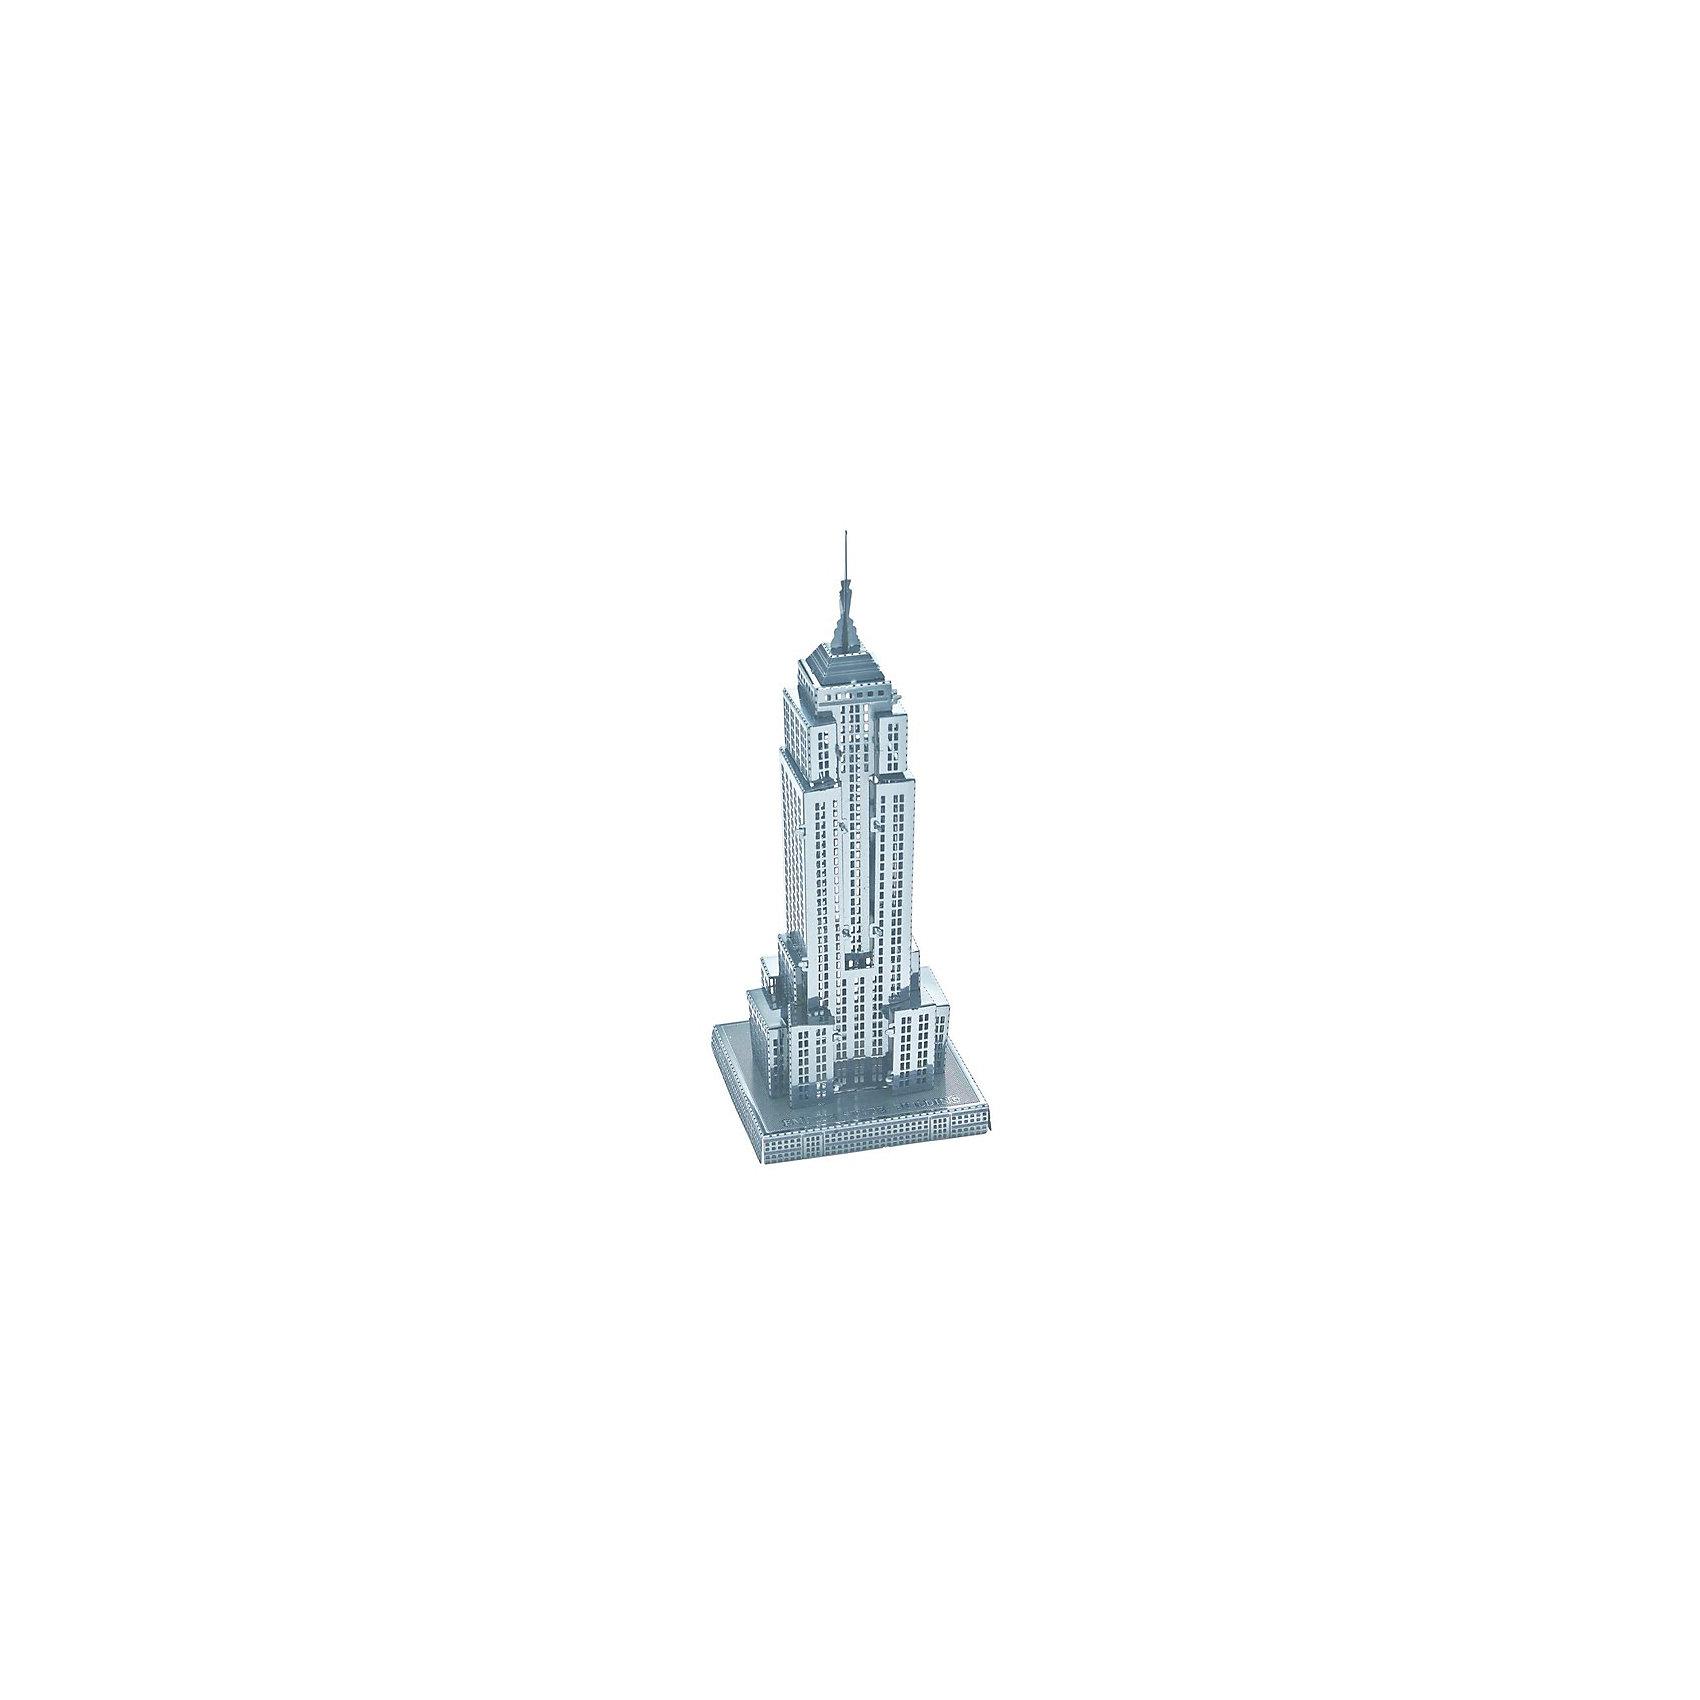 Сборная модель-3D Небоскреб Empire State Building L<br><br>Ширина мм: 17<br>Глубина мм: 12<br>Высота мм: 10<br>Вес г: 28<br>Возраст от месяцев: 144<br>Возраст до месяцев: 2147483647<br>Пол: Унисекс<br>Возраст: Детский<br>SKU: 5362970